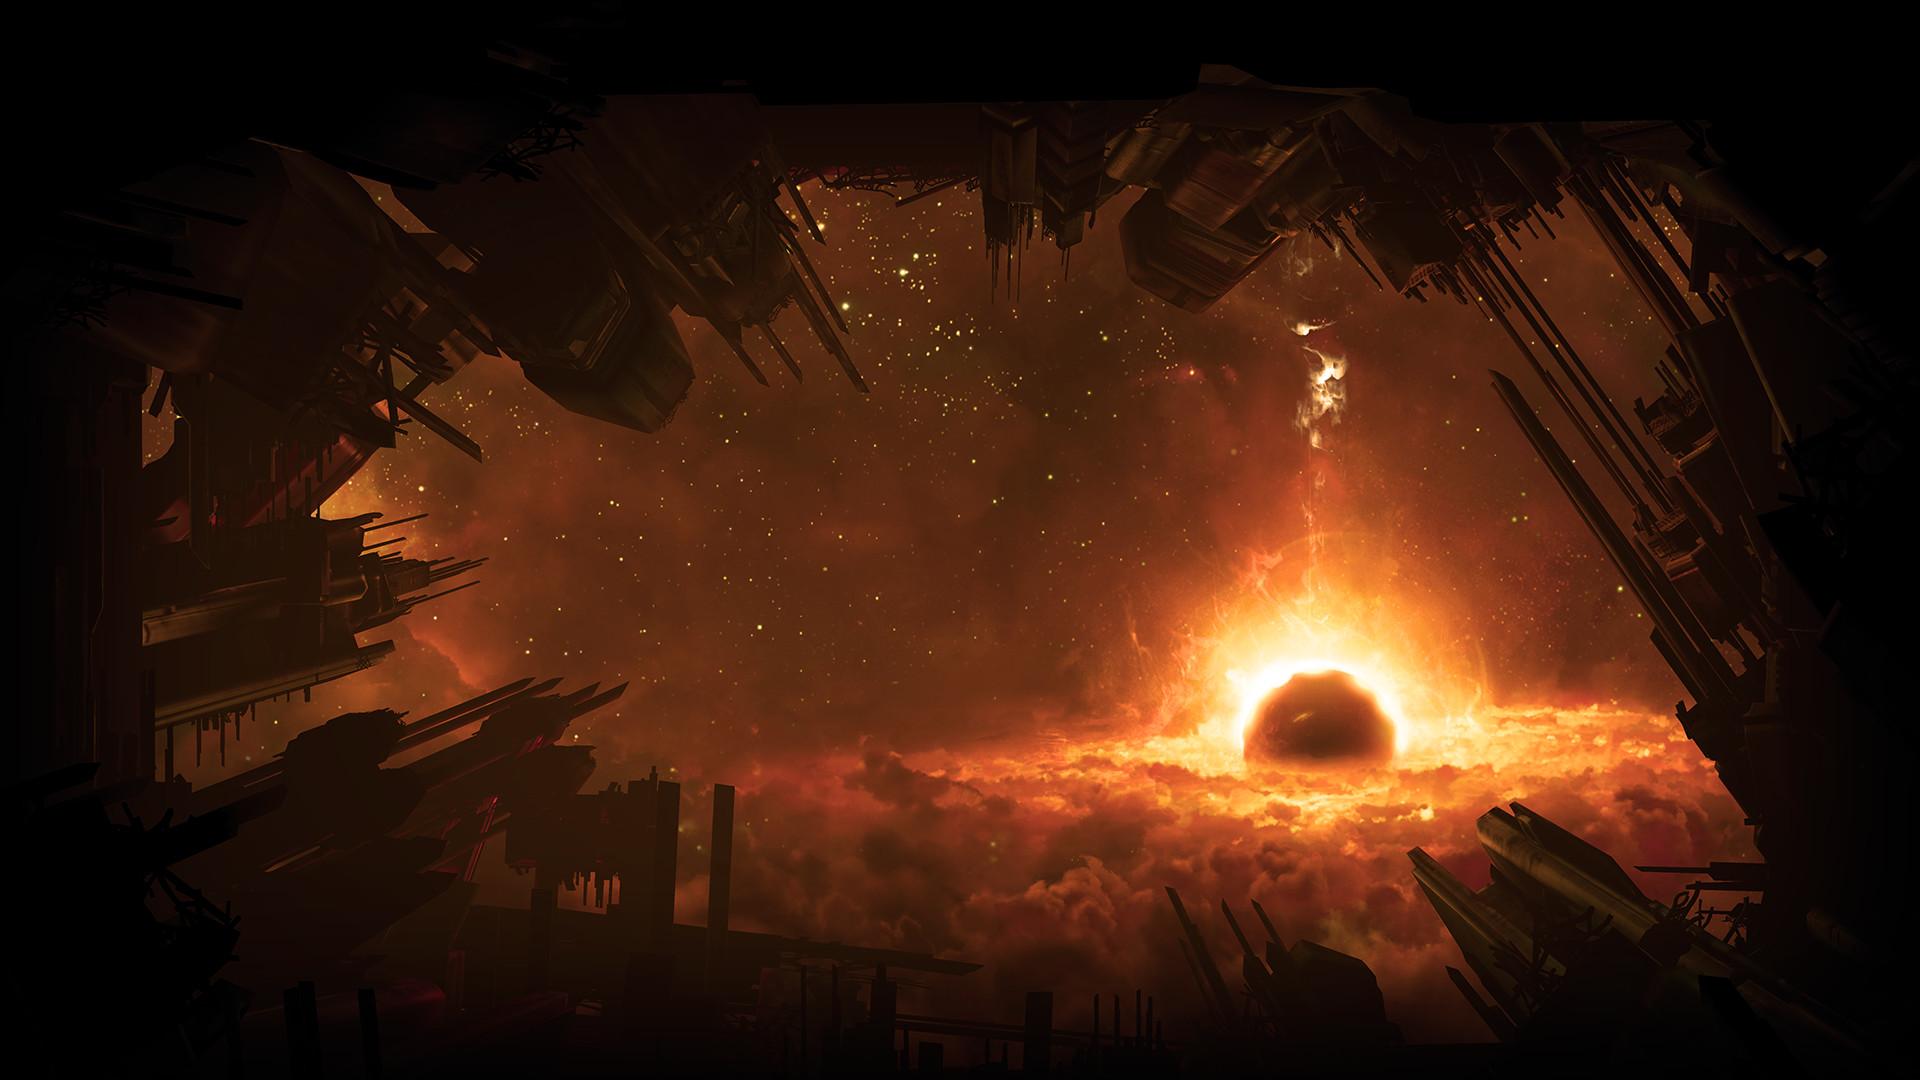 Best Mass Effect Cerberus px Wallpaper by Katelynn Armor